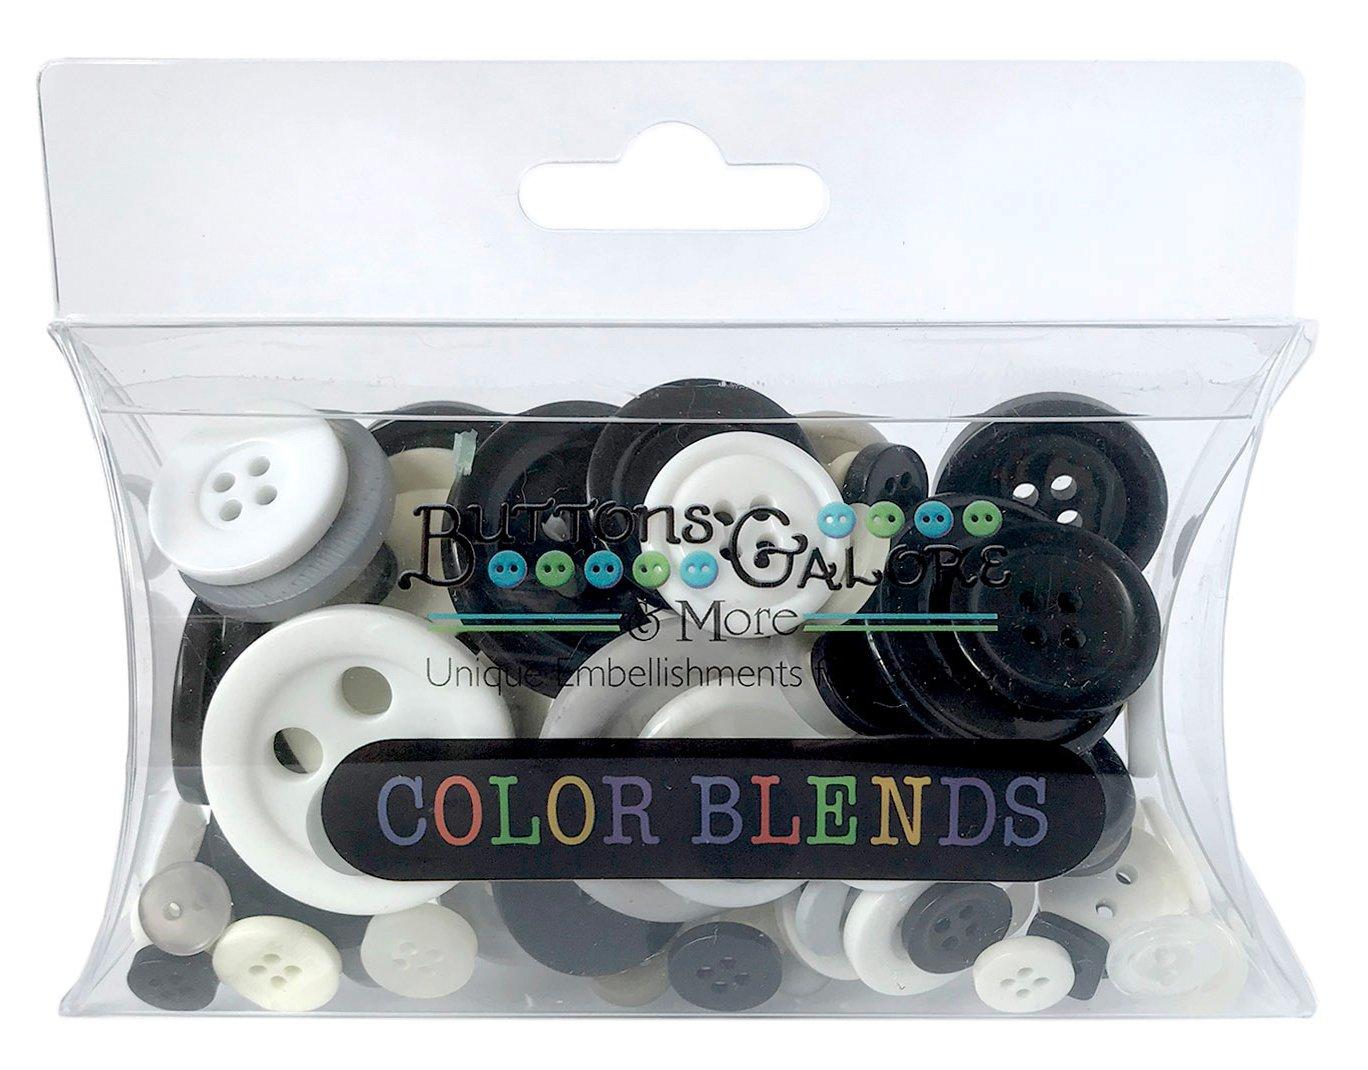 Buttons Galore BGCB113 CB100カラーブレンドボタン、3オンス、クッキー&クリーム、ブラック/ホワイト   B00B5BIFFU